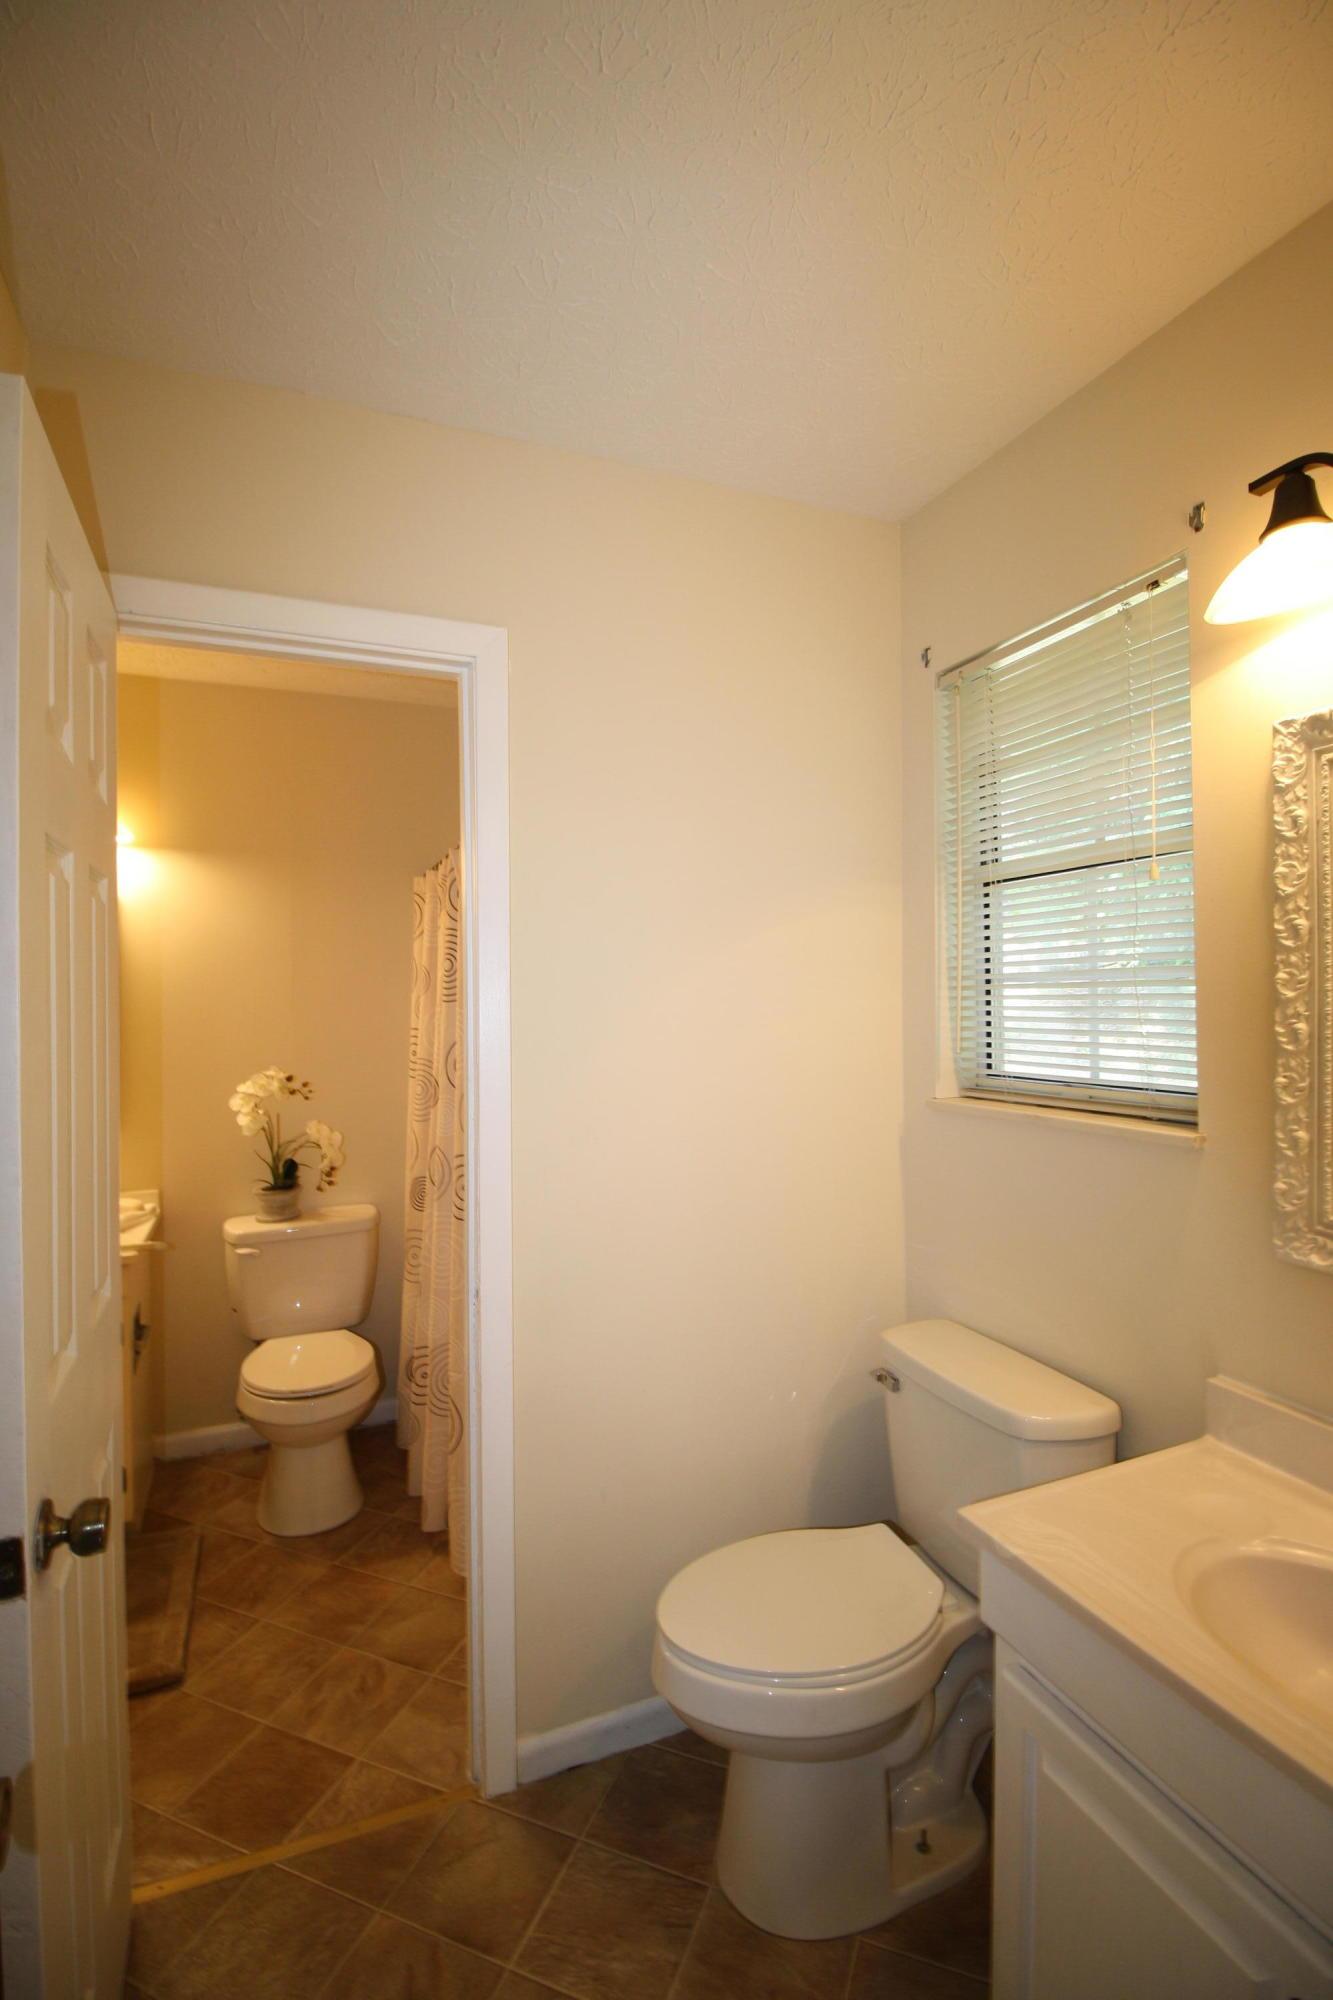 5013 Laurel Woods Drive, Knoxville, Tennessee 37921, 3 Bedrooms Bedrooms, ,2 BathroomsBathrooms,Single Family,For Sale,Laurel Woods,1093912